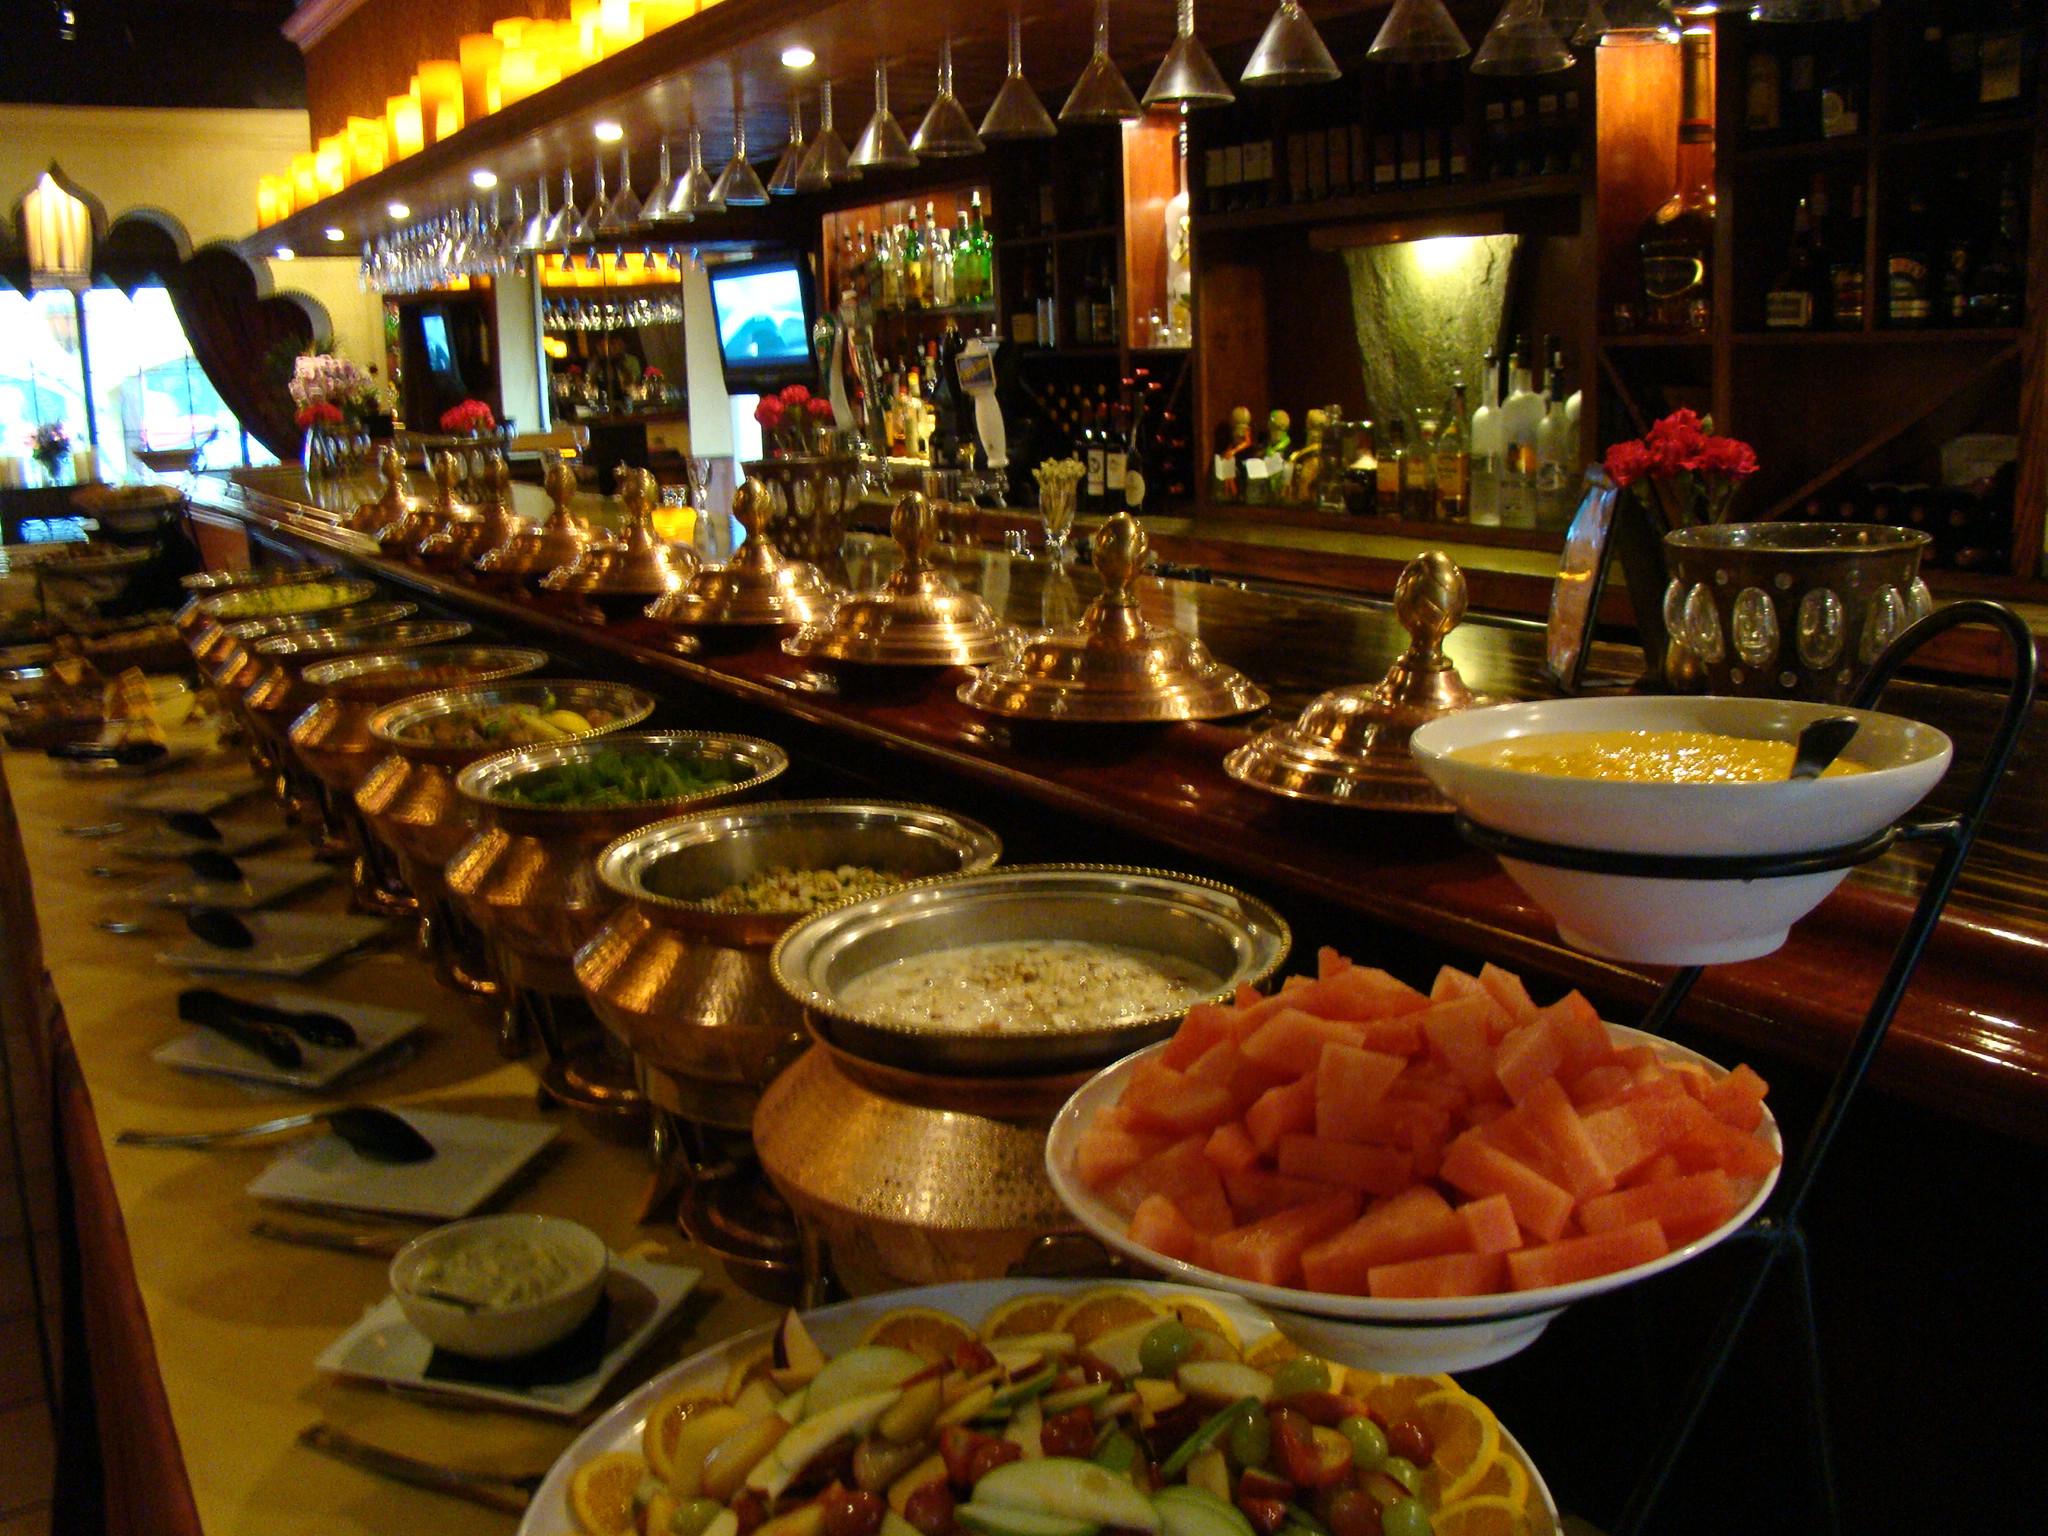 Easter Dinner Restaurants  GoingOut India Restaurant Event Easter Buffet Brunch